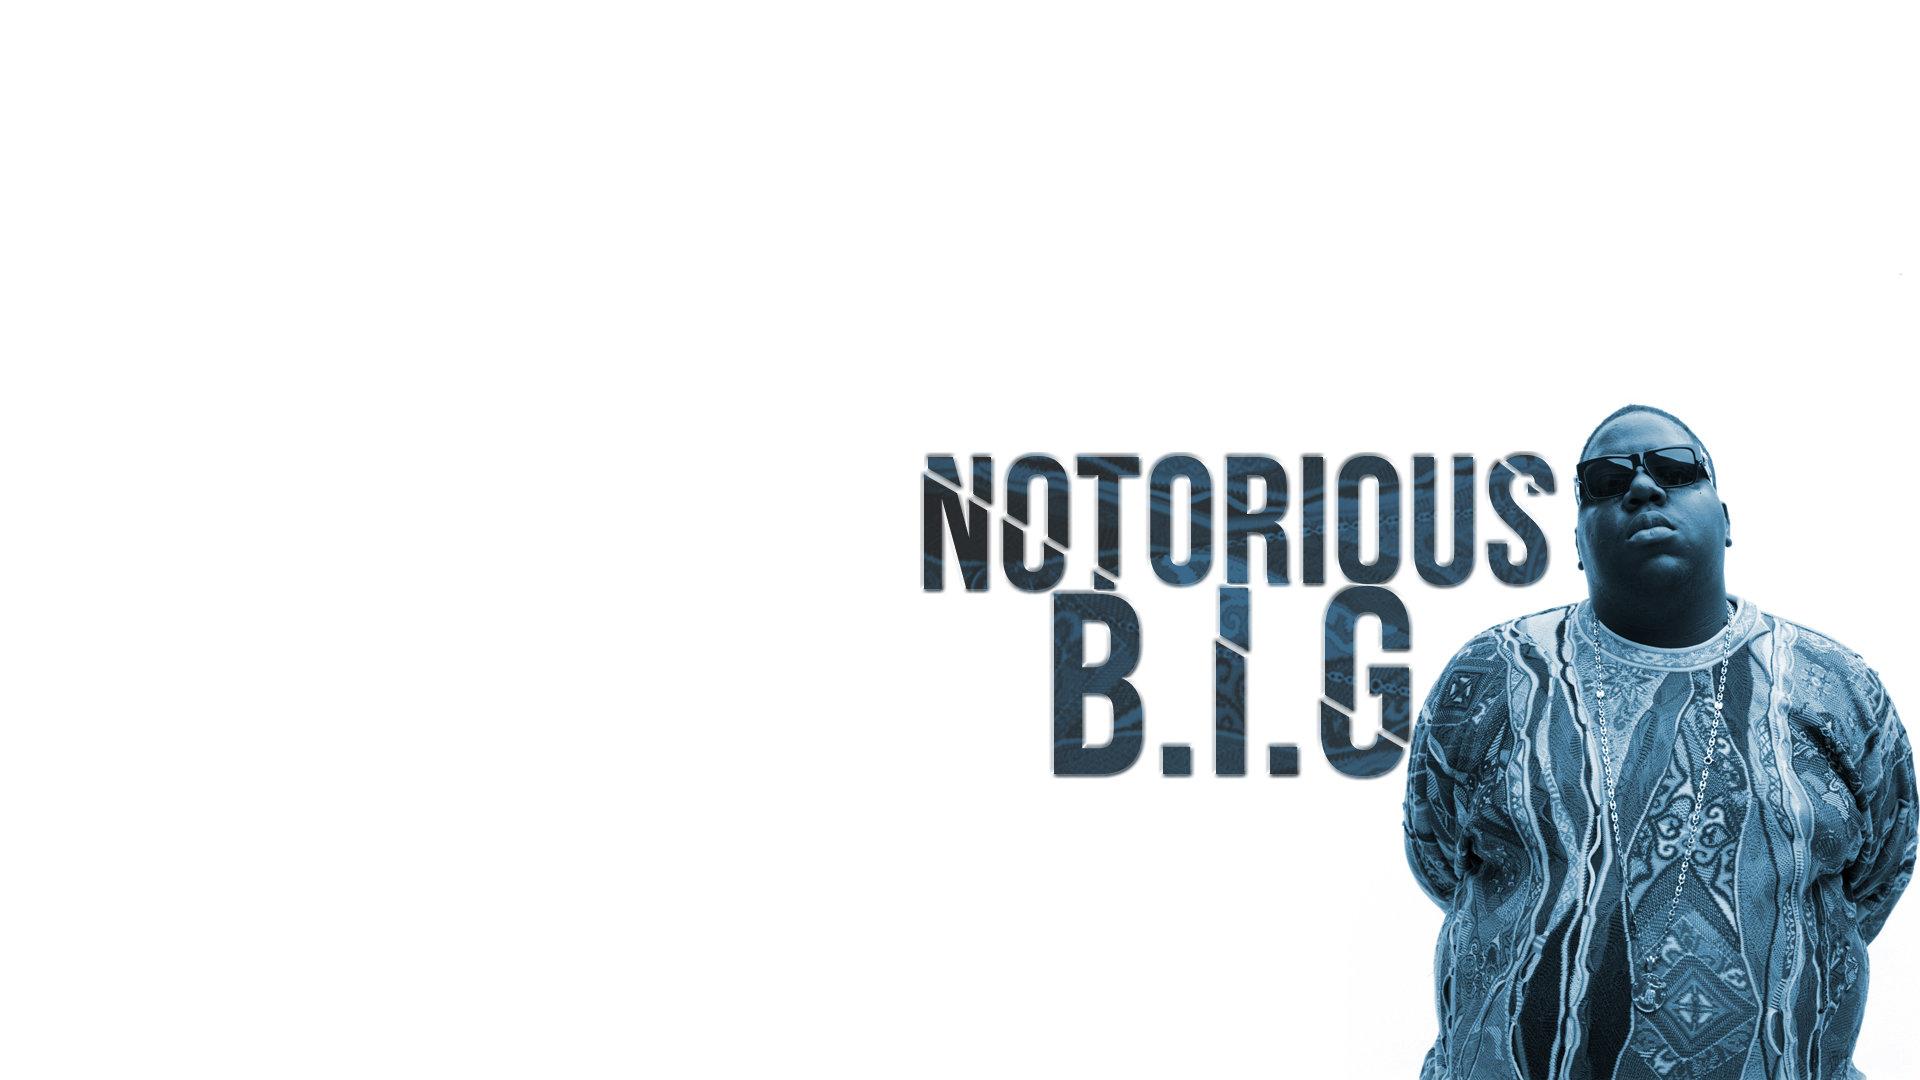 Free Biggie smalls (The Notorious B.I.G